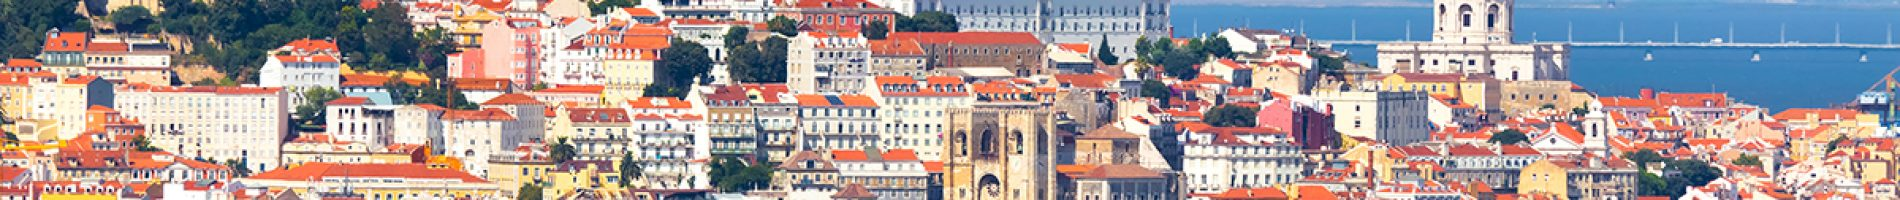 cidadania-portugal